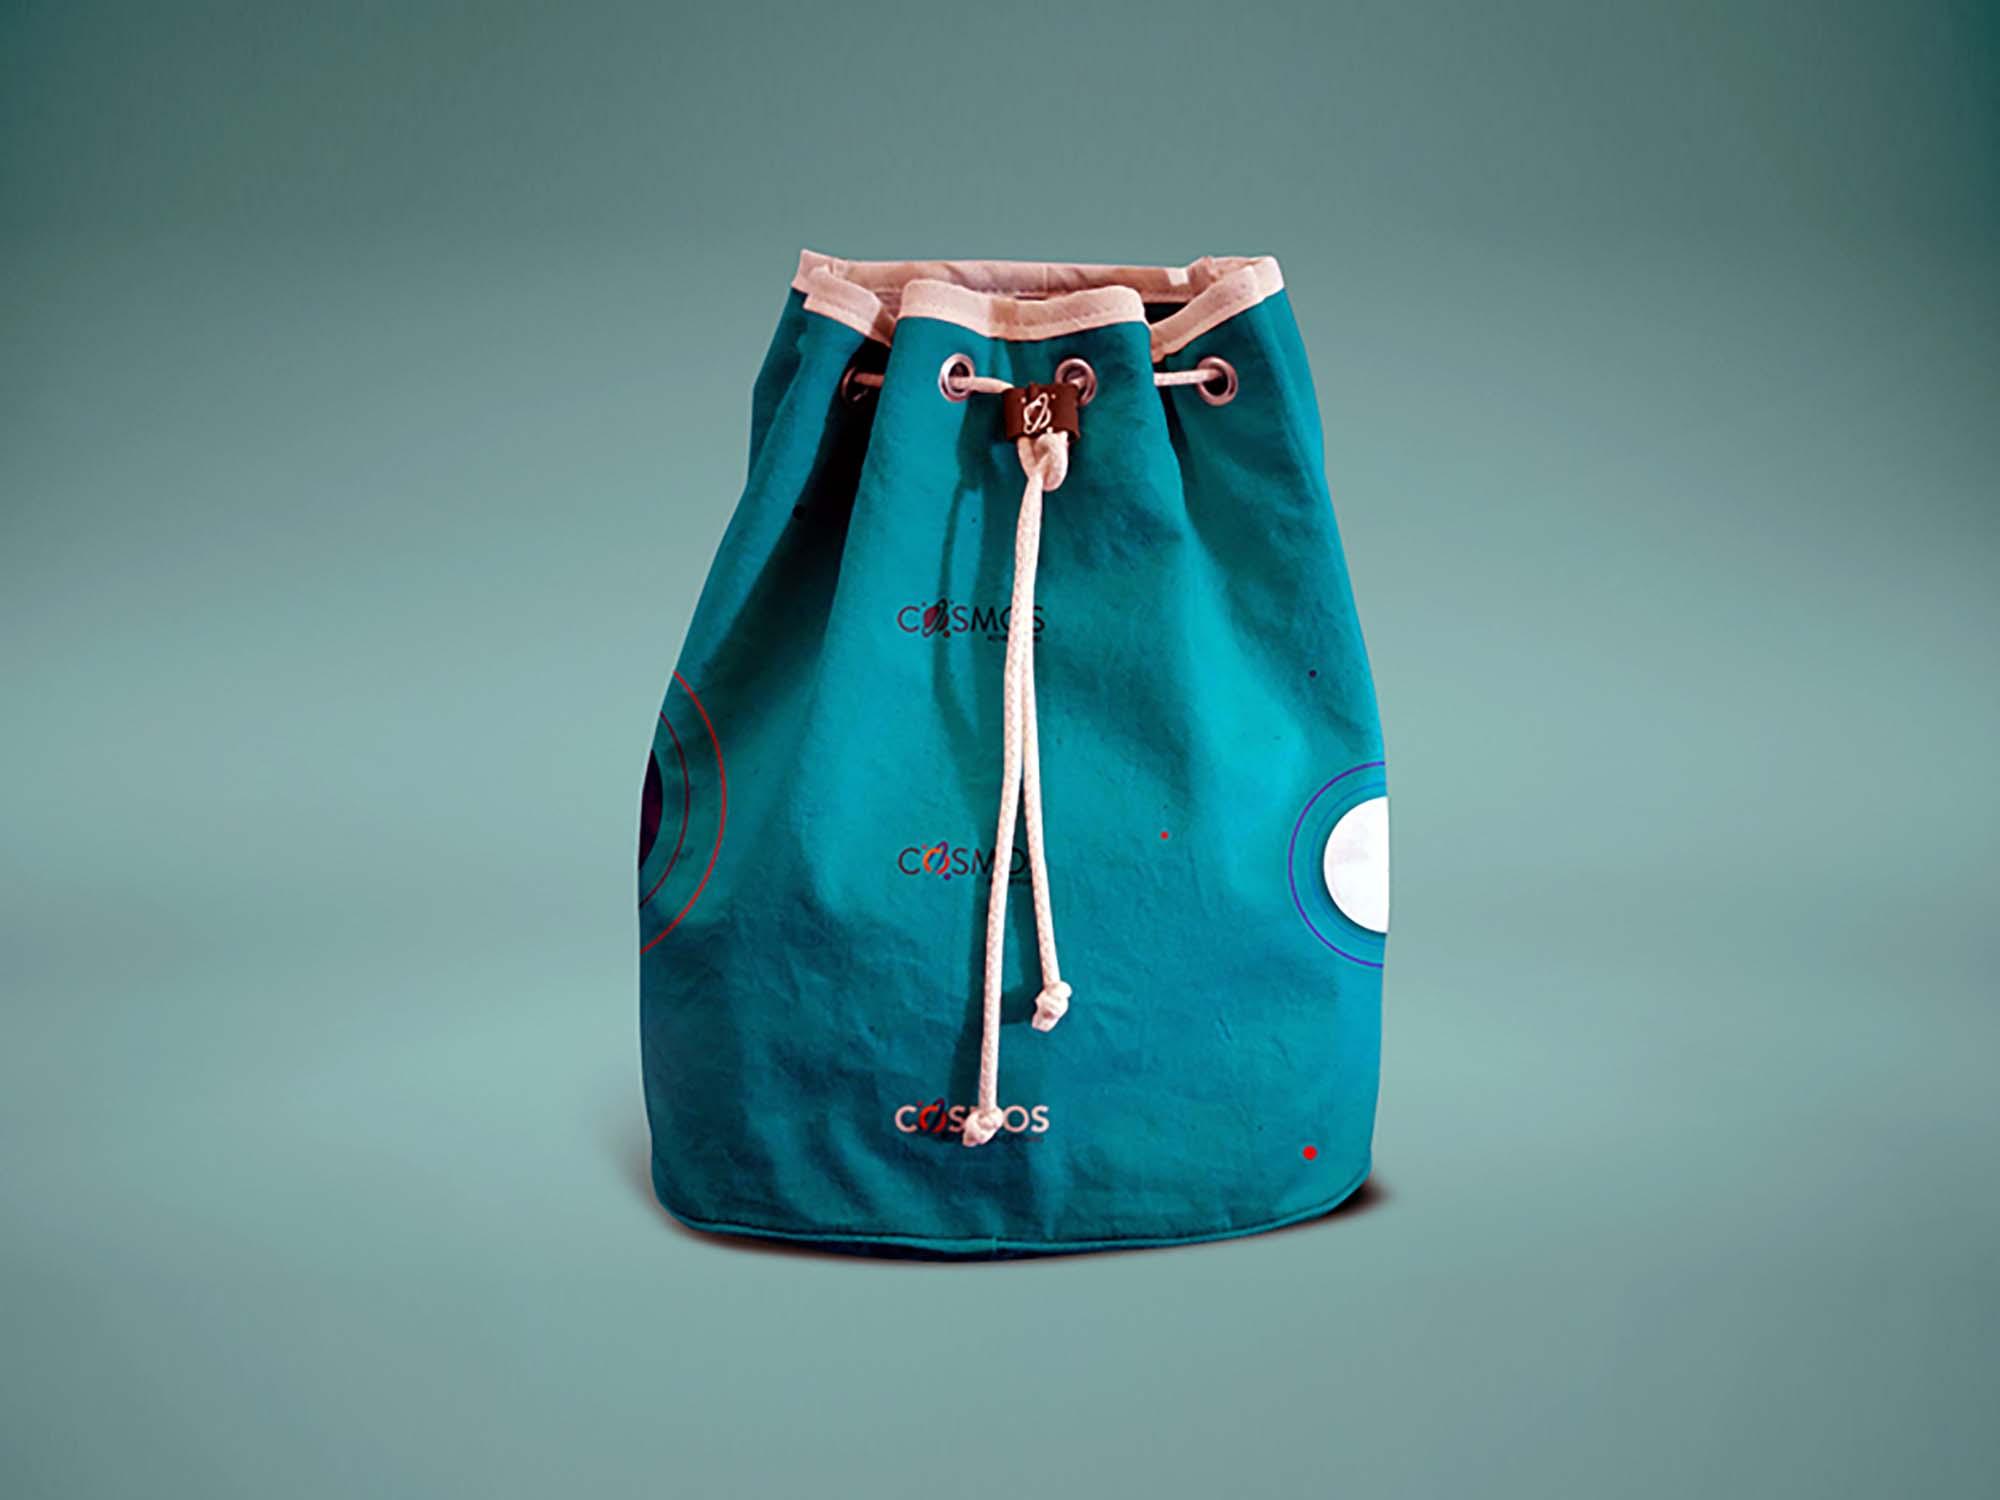 Cloth Bag Mockup 2